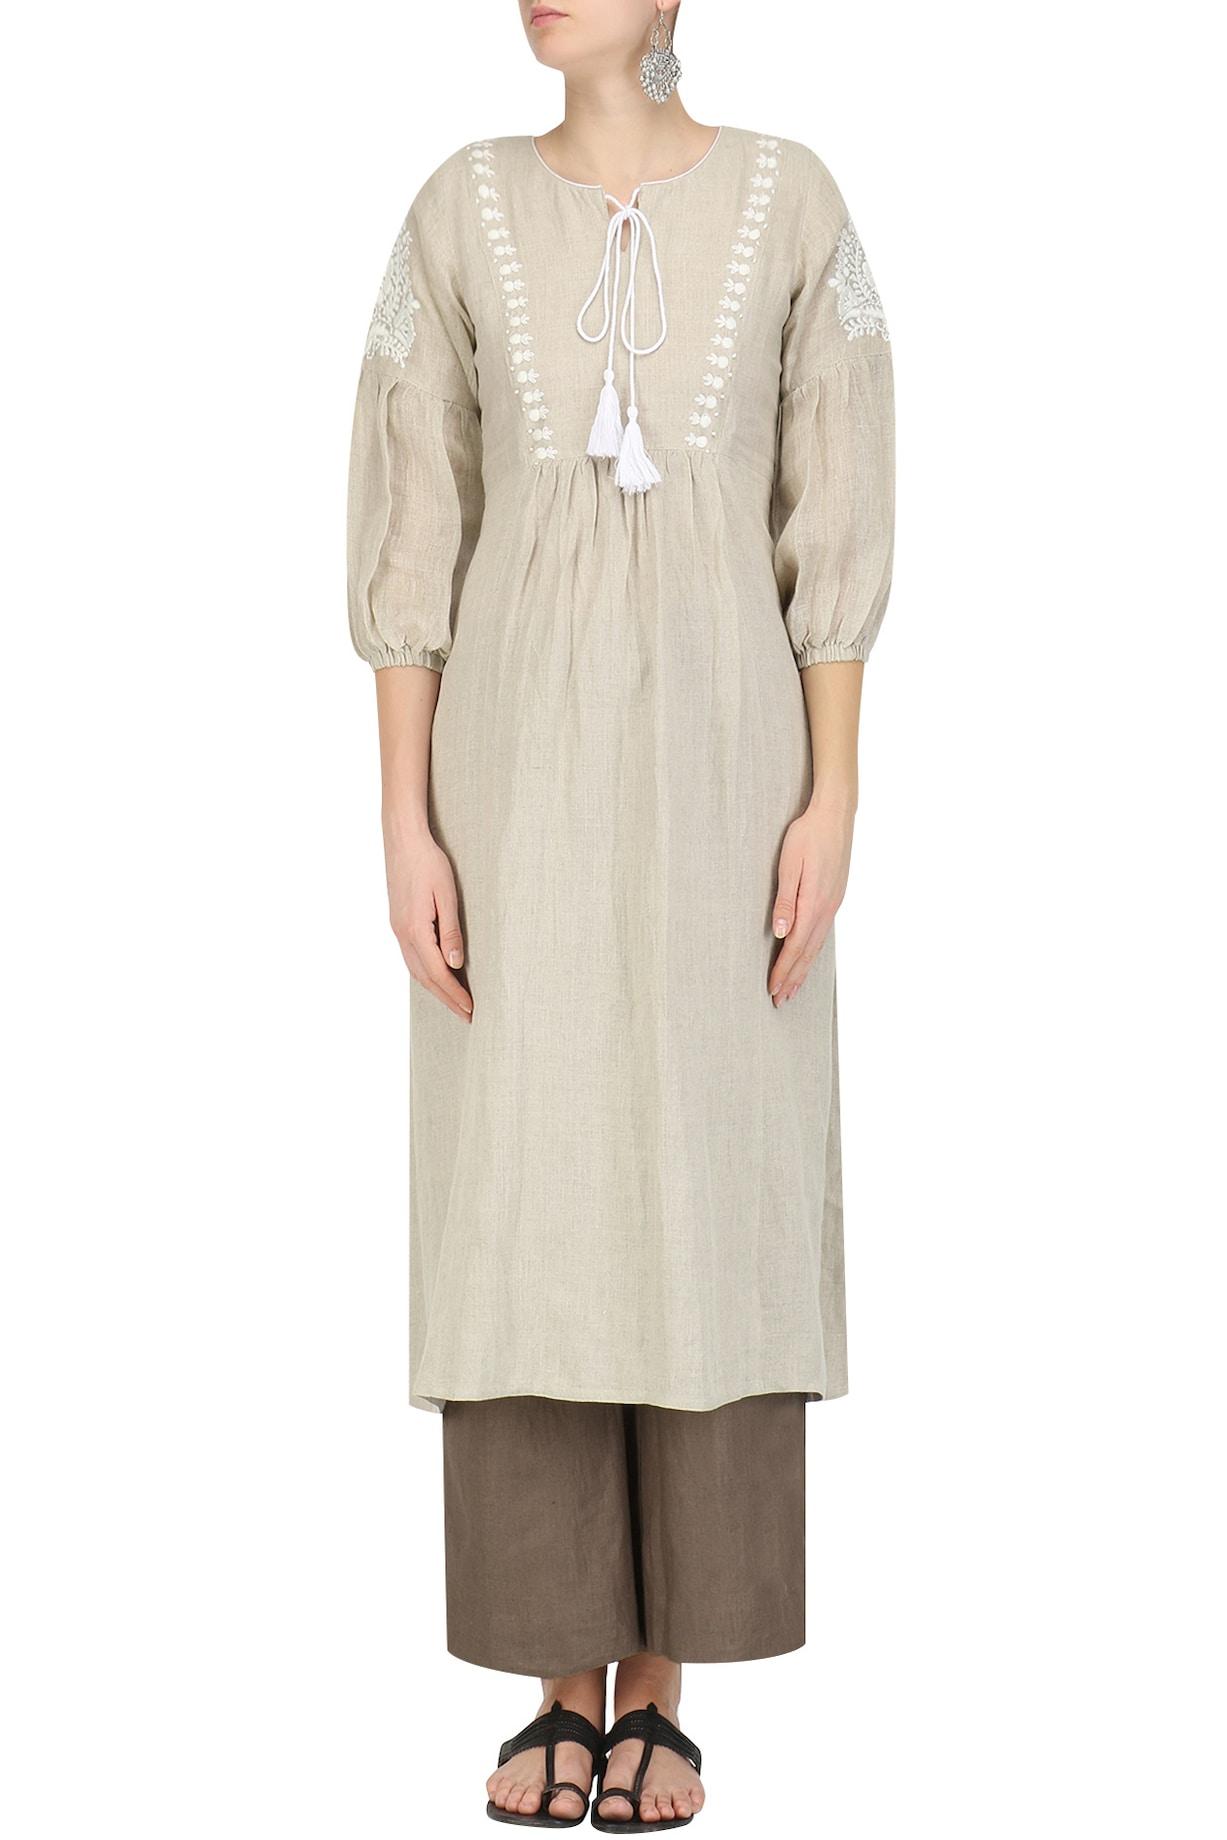 Linen and Linens Dresses